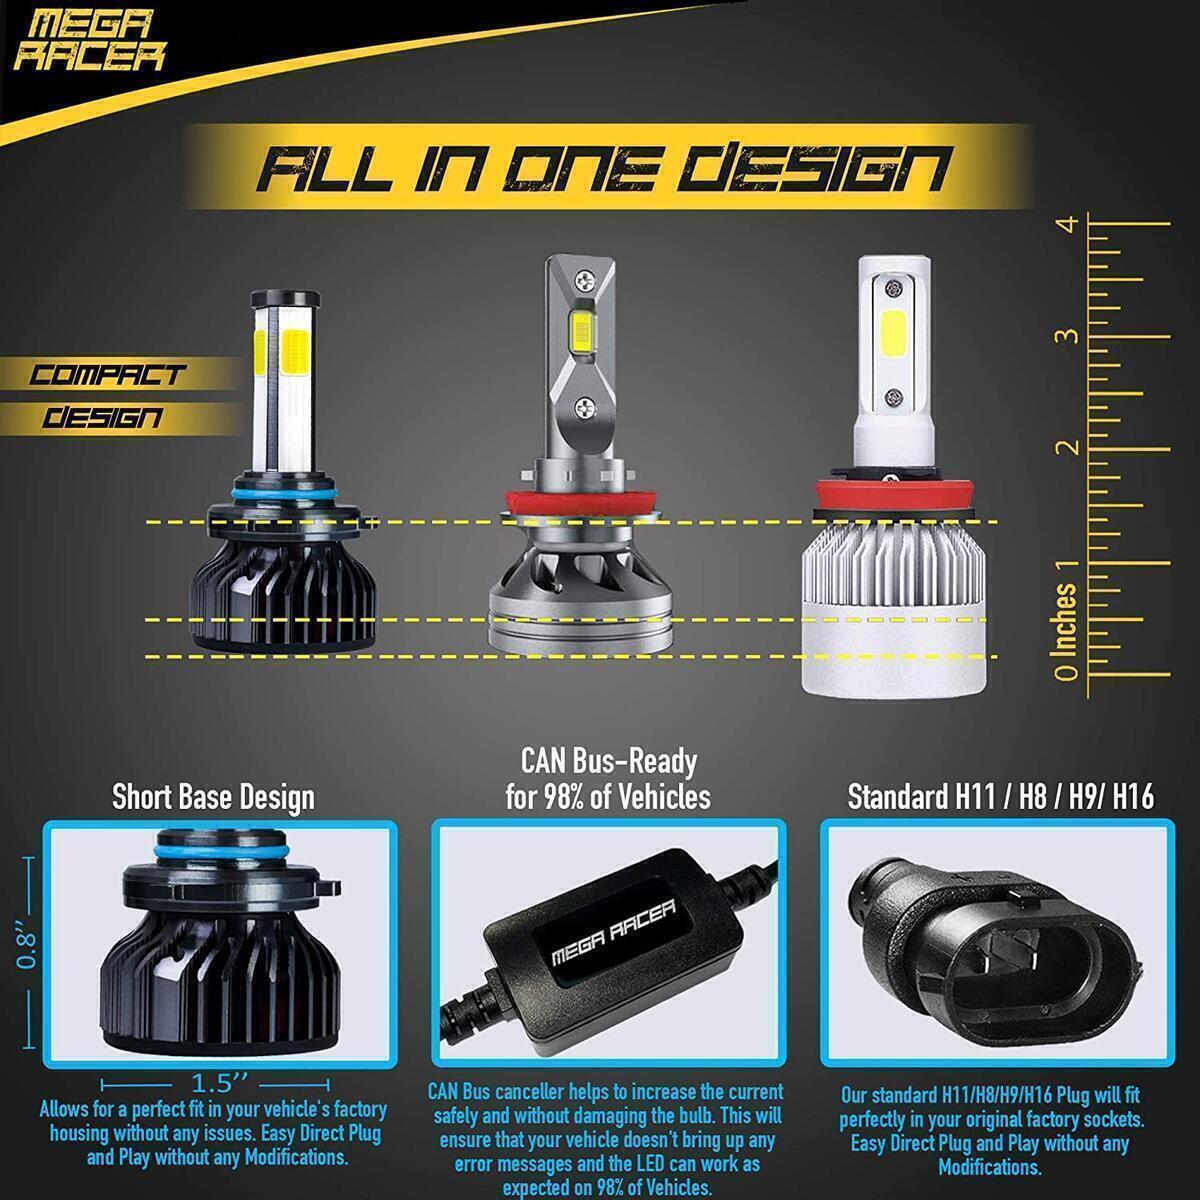 Mega Racer 4 Sided 9005/H10/HB3 LED Headlight Bulb - High Beam, Fog Light, or Low Beam 60 Watt 6000K Diamond White 10000 LM COB IP68 Waterproof Rating, 2 Pieces